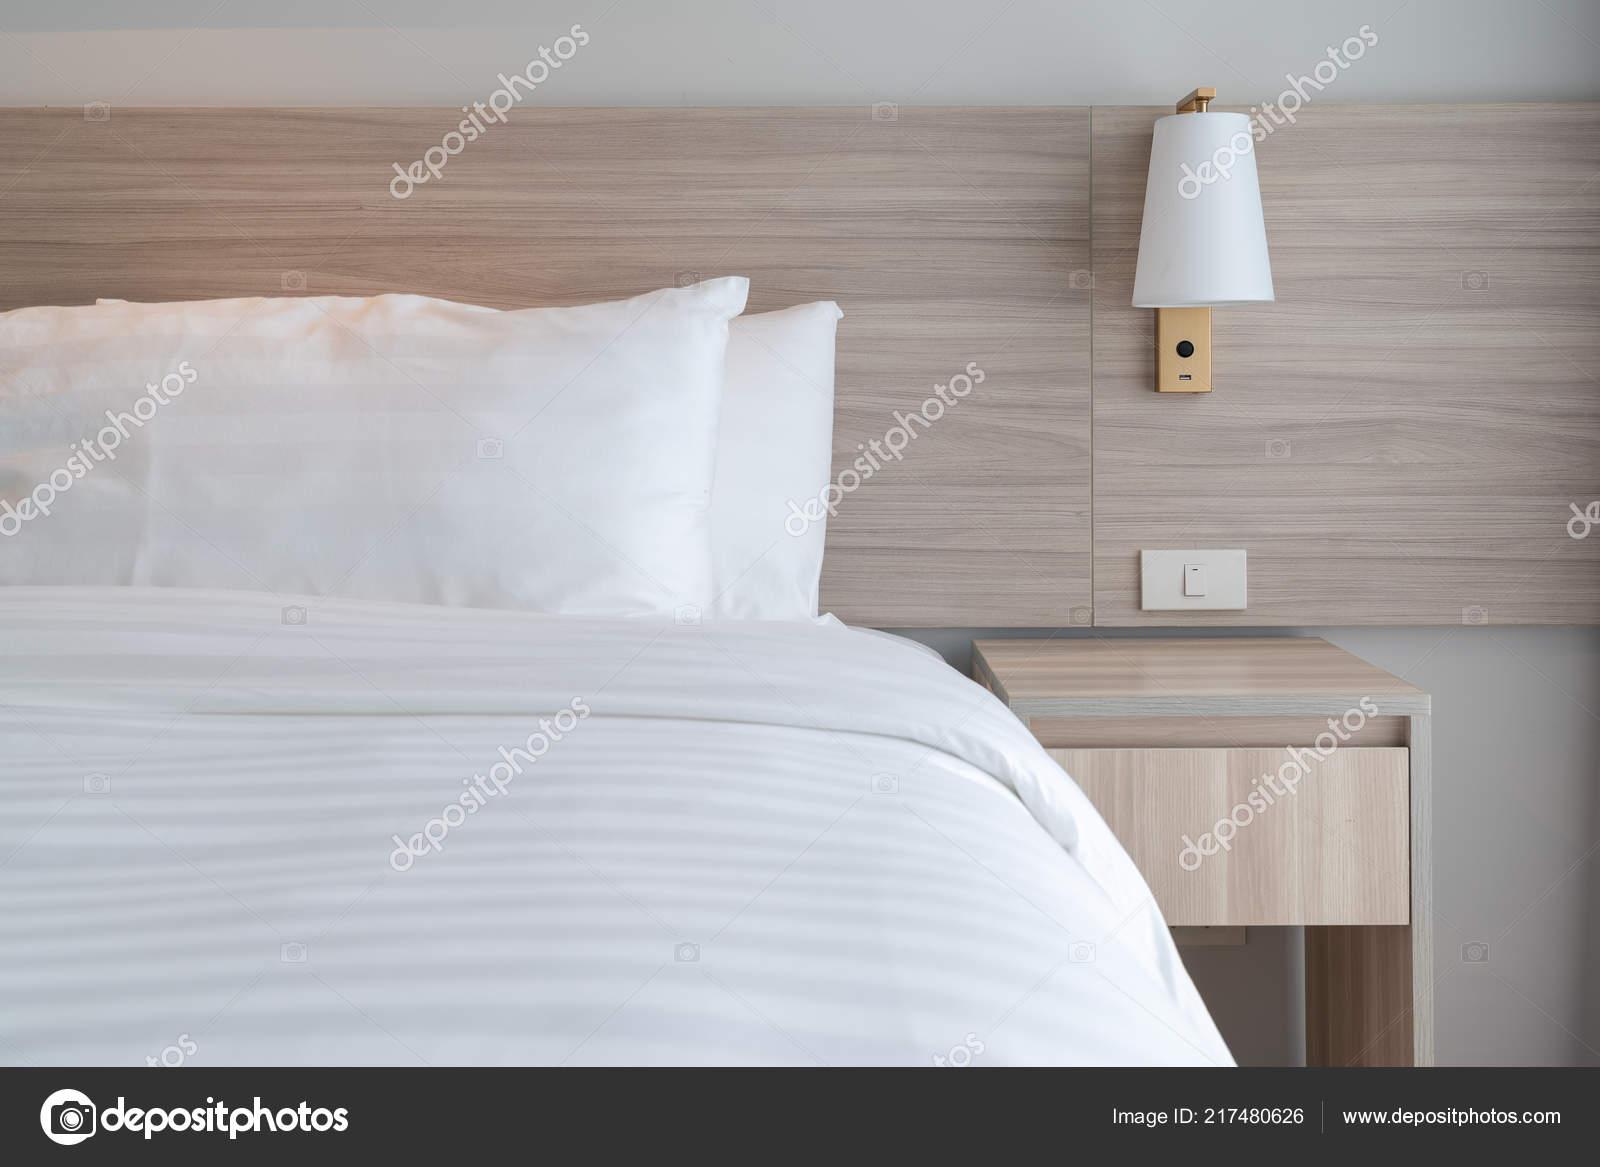 Moderne slaapkamer met houten bed witte kleur toon kussens interieur